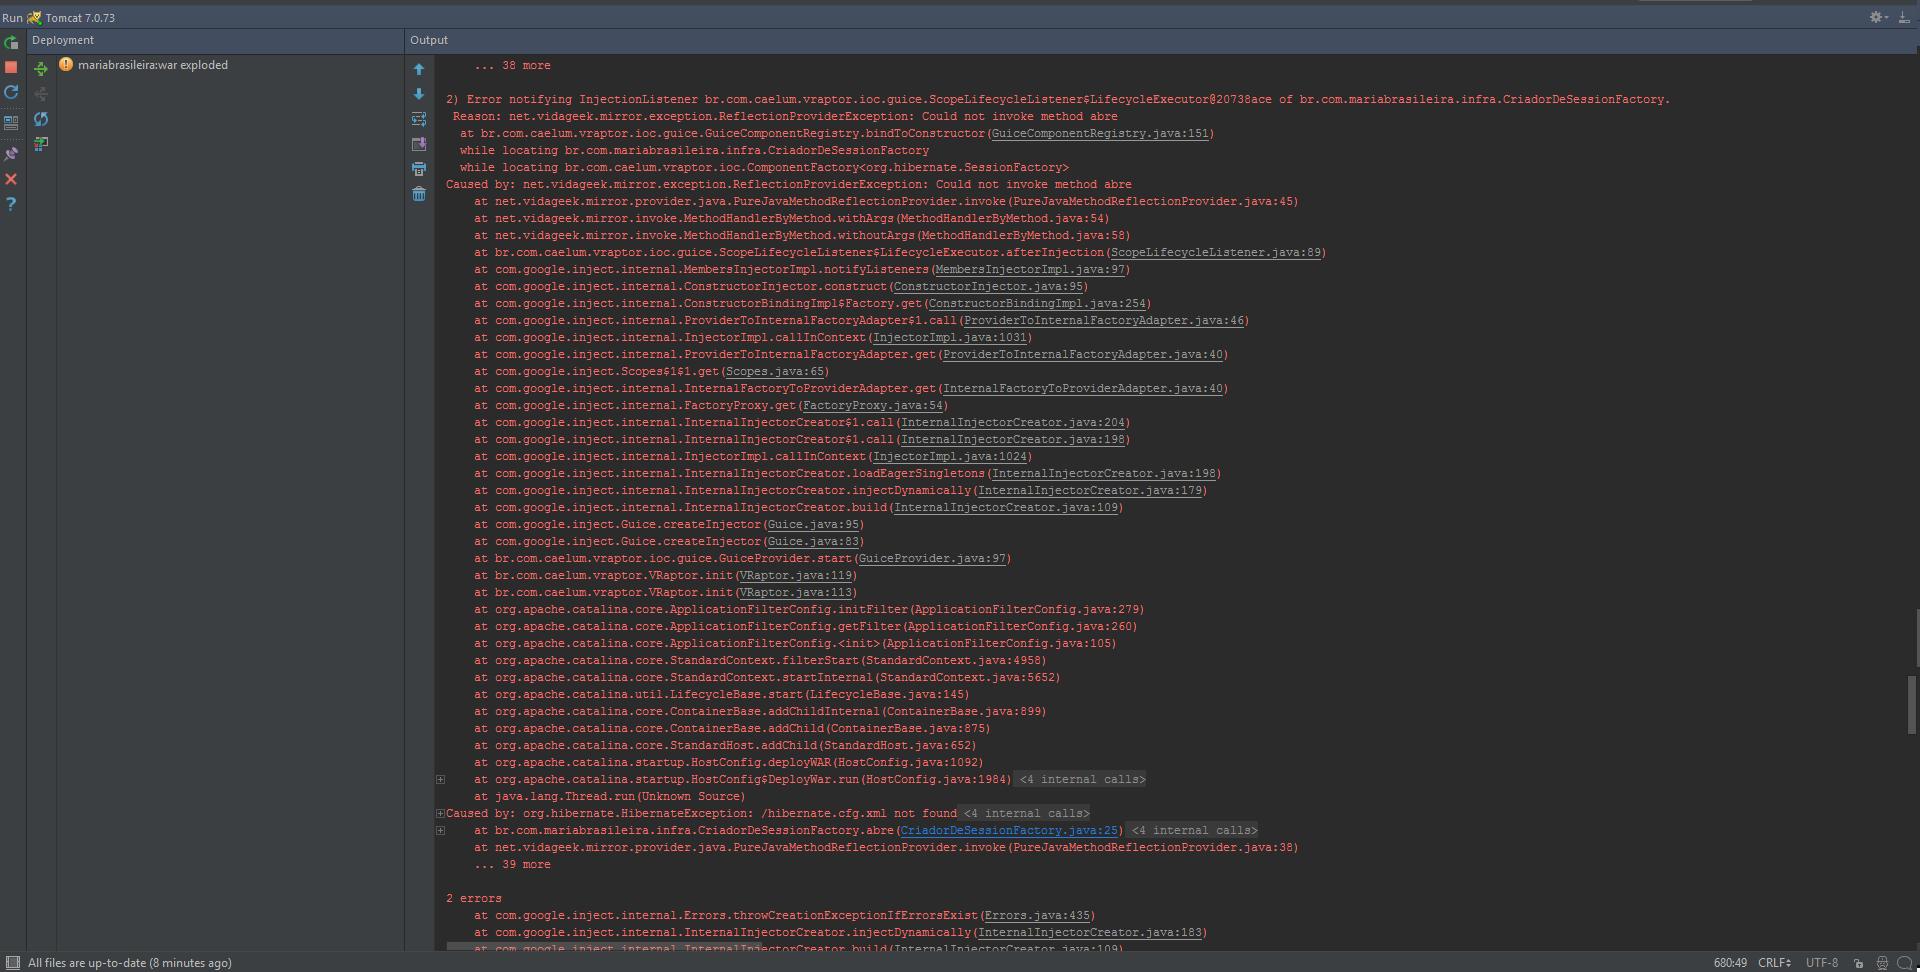 Erro ao rodar projeto do Eclipse no Intellij - Java - GUJ